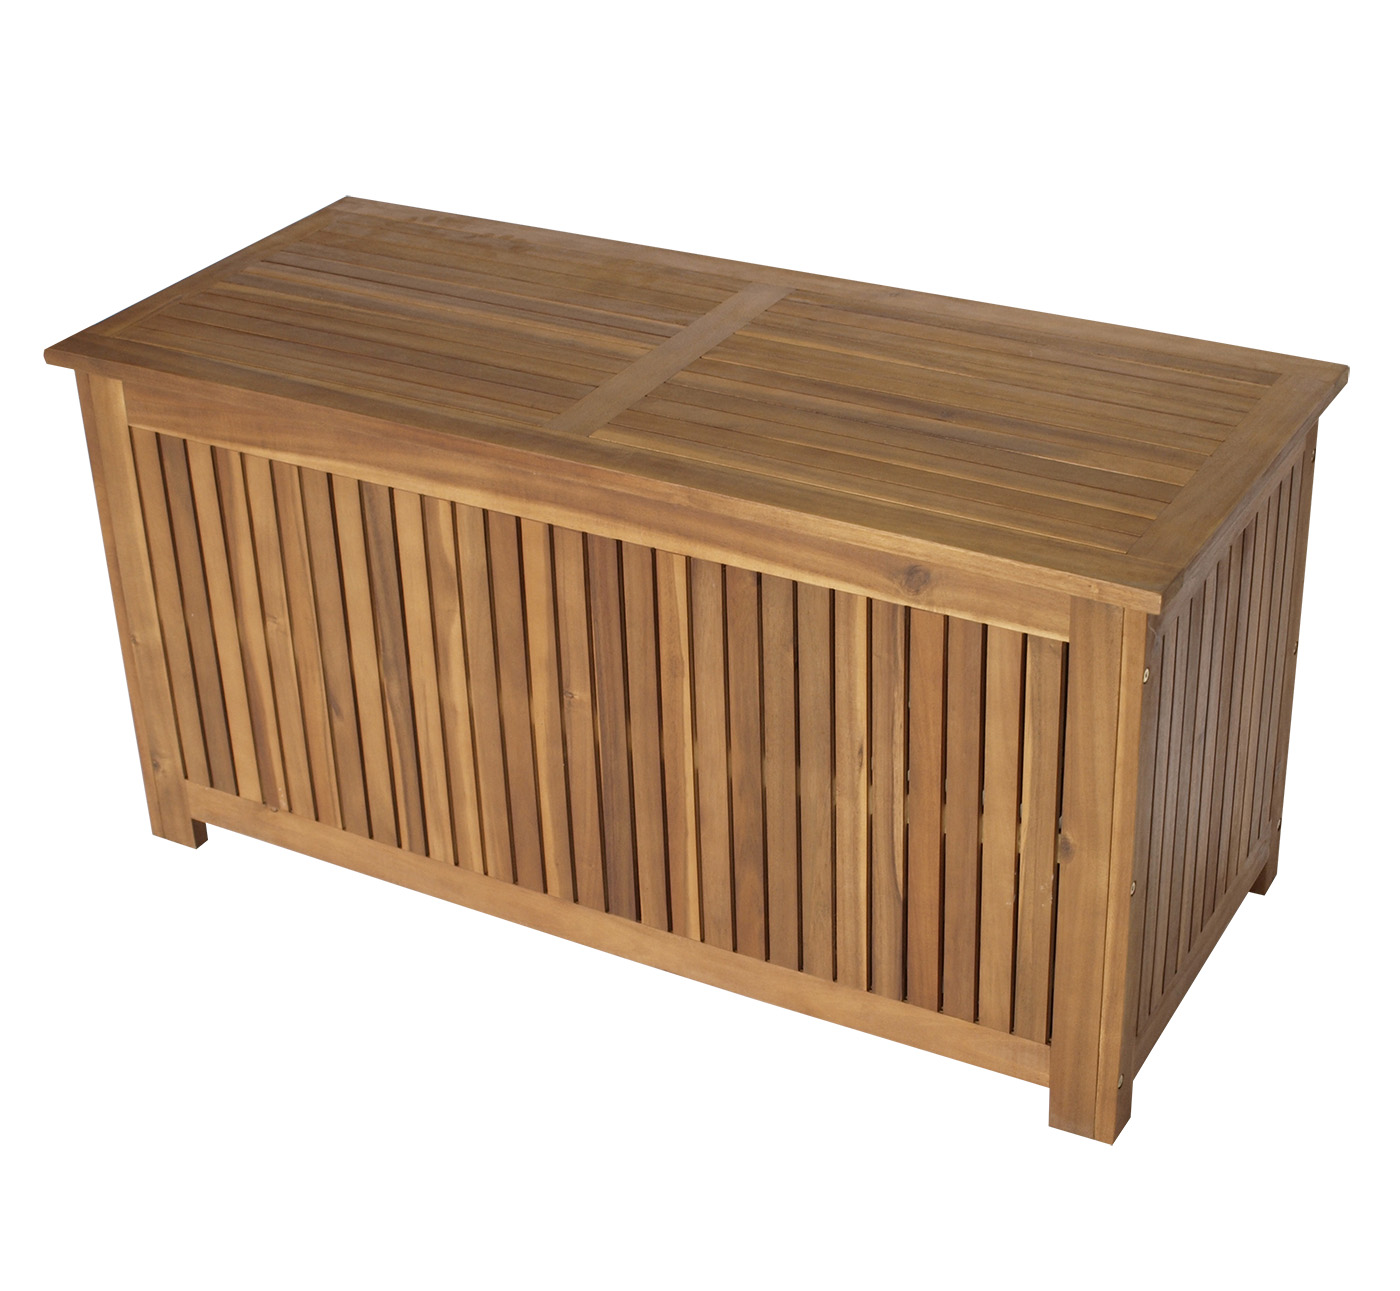 auflagenbox kissenbox kissentruhe gartentruhe gartenbox st vincent 117cm holz ebay. Black Bedroom Furniture Sets. Home Design Ideas